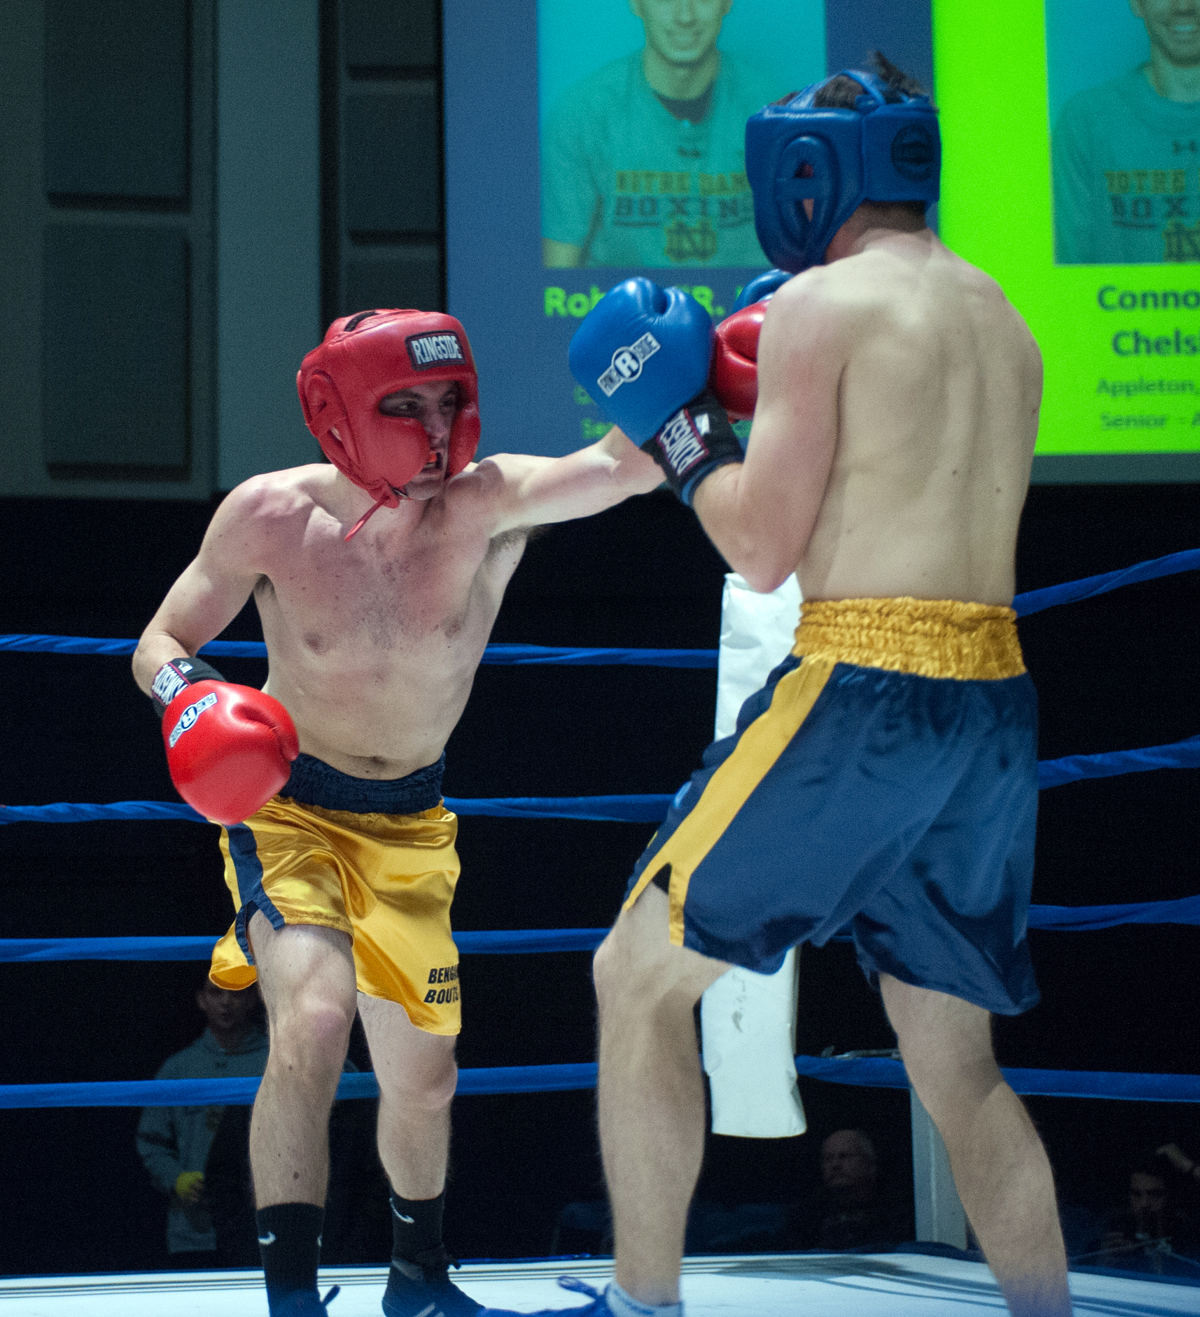 Chelsky LEFT 1,  20150218, Bengal Bouts, Caroline Genco, Devine (W) vs. Chelsky-2